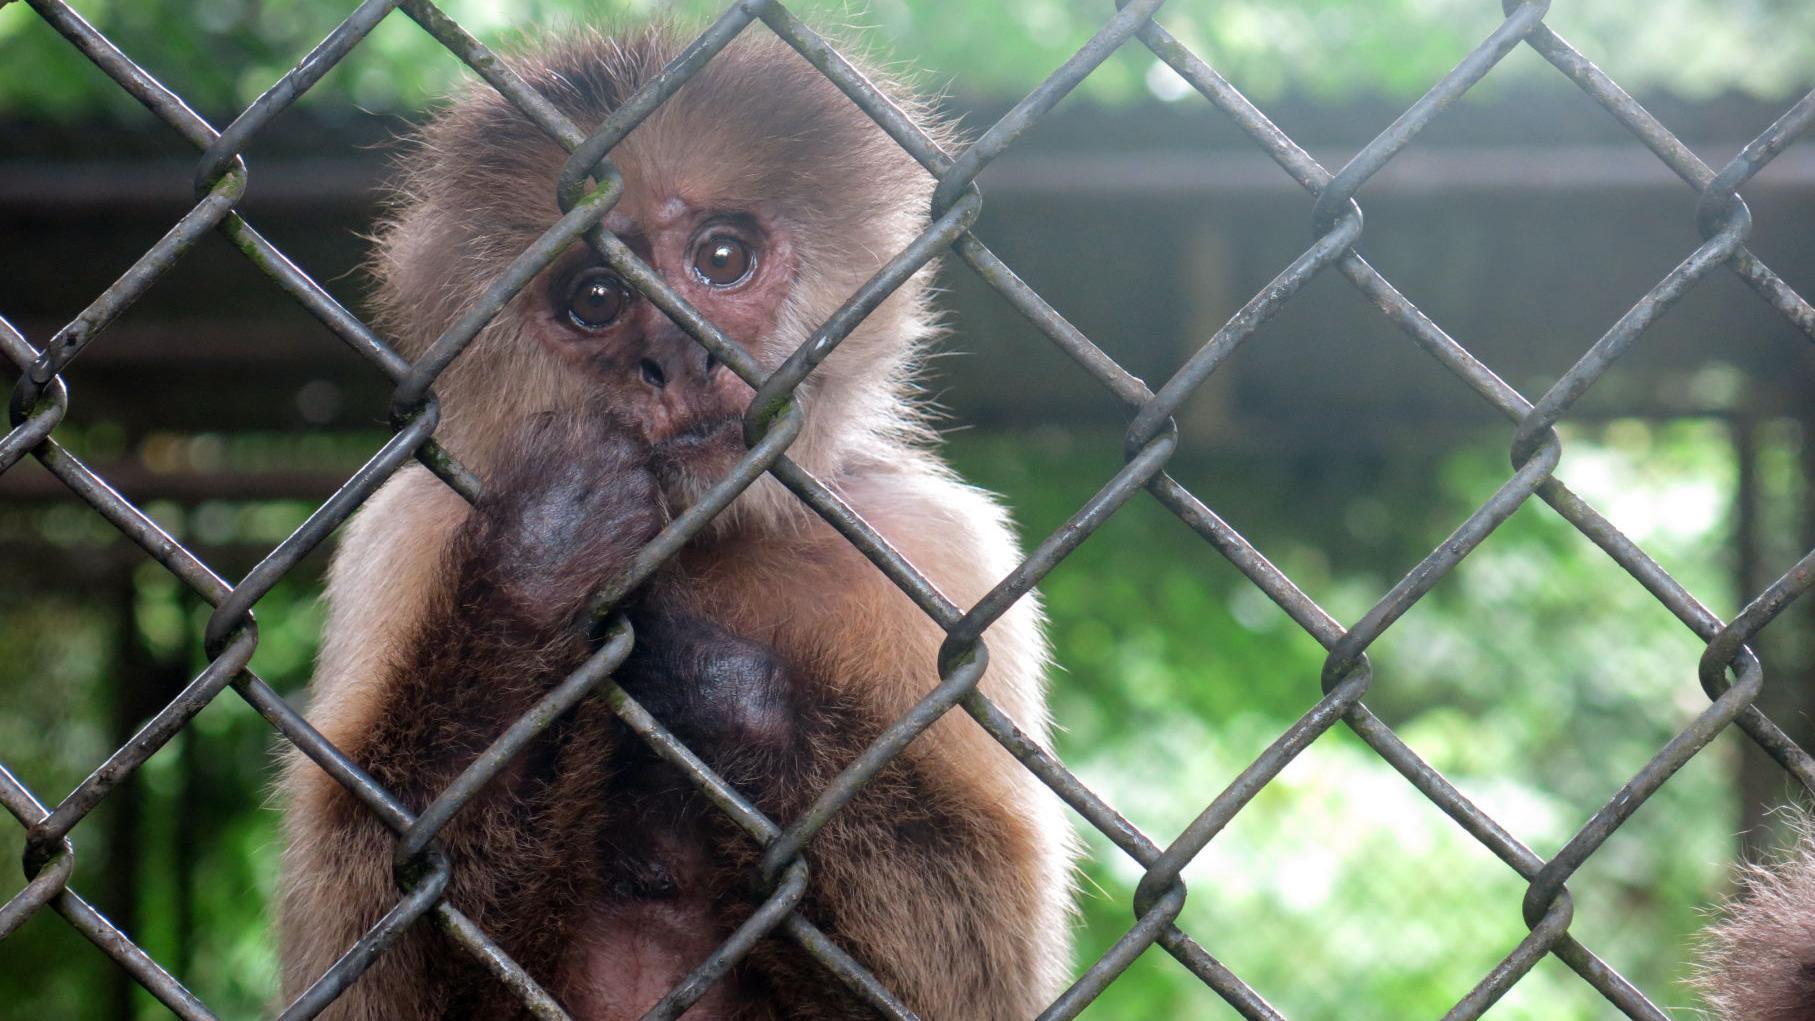 Photos: Economic crisis hits Puerto Rico's only zoo